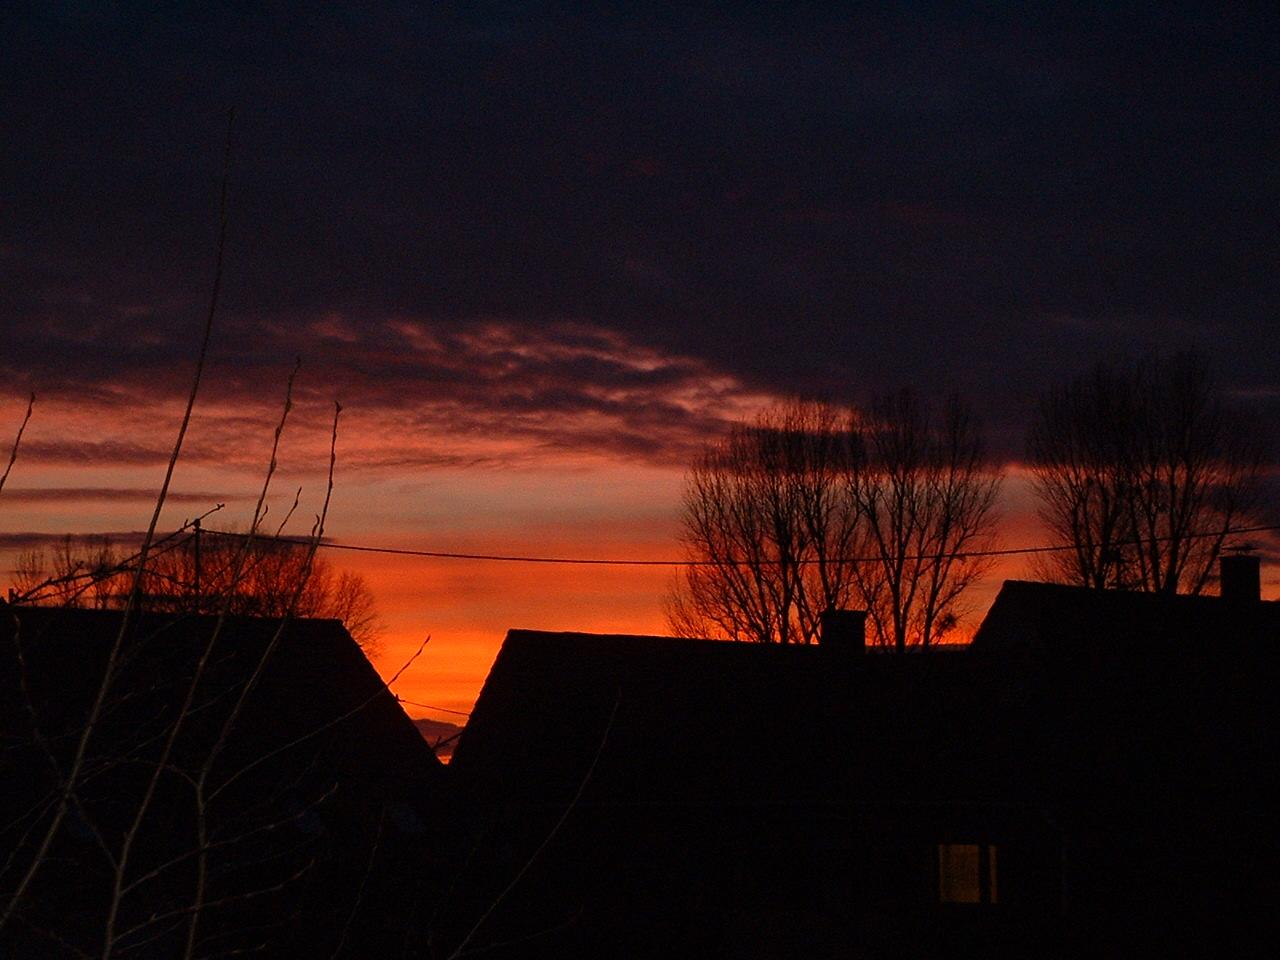 Wunderschöner Sonnenuntergang Karlsruhe Januar 2011